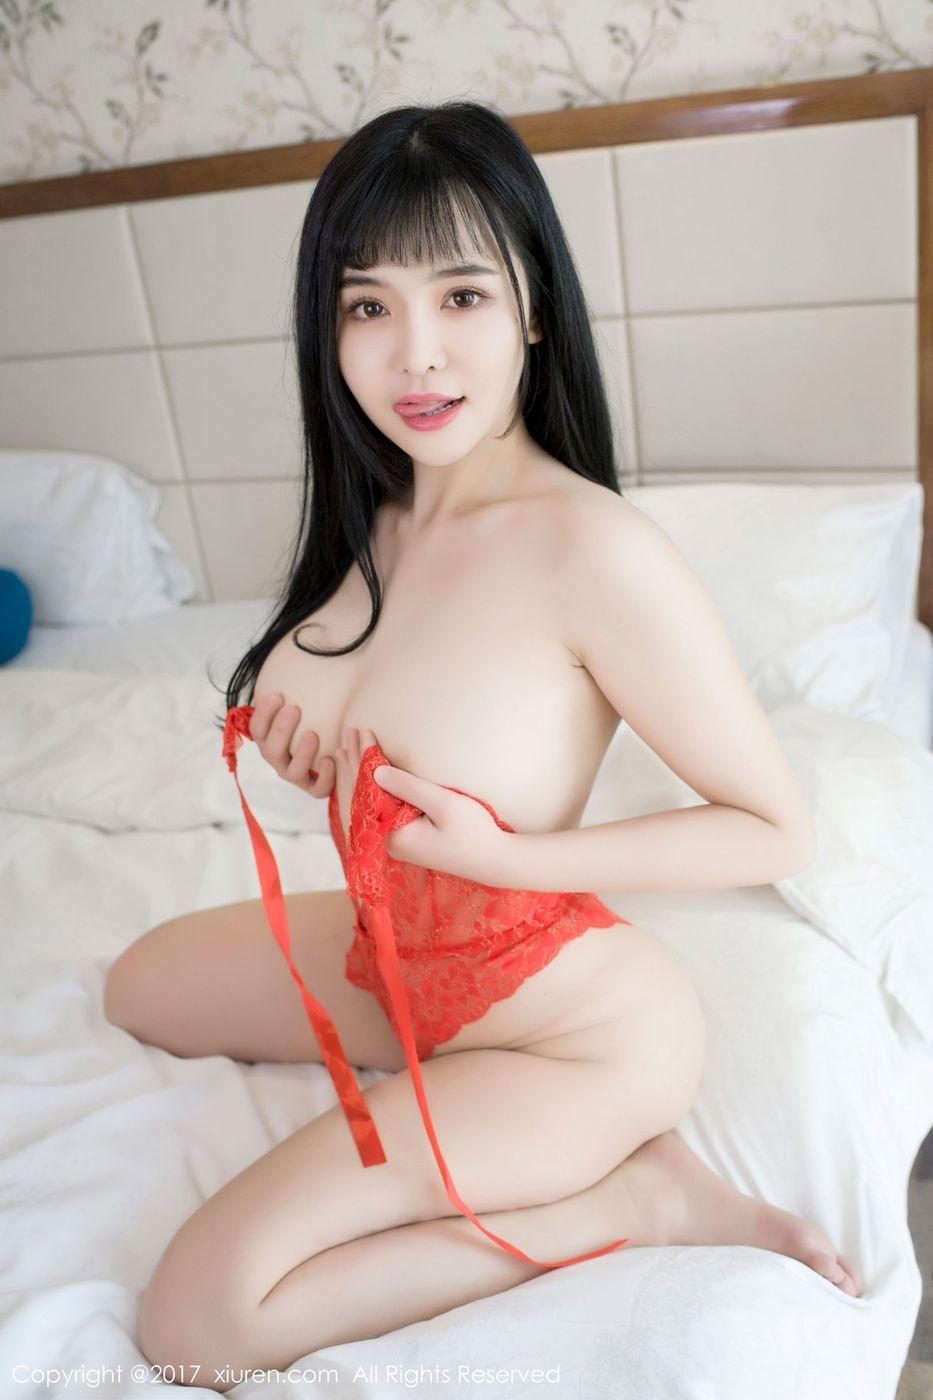 [XiuRen秀人网] 性感美女刘钰儿开胸比基尼半透制服诱惑写真 No.734